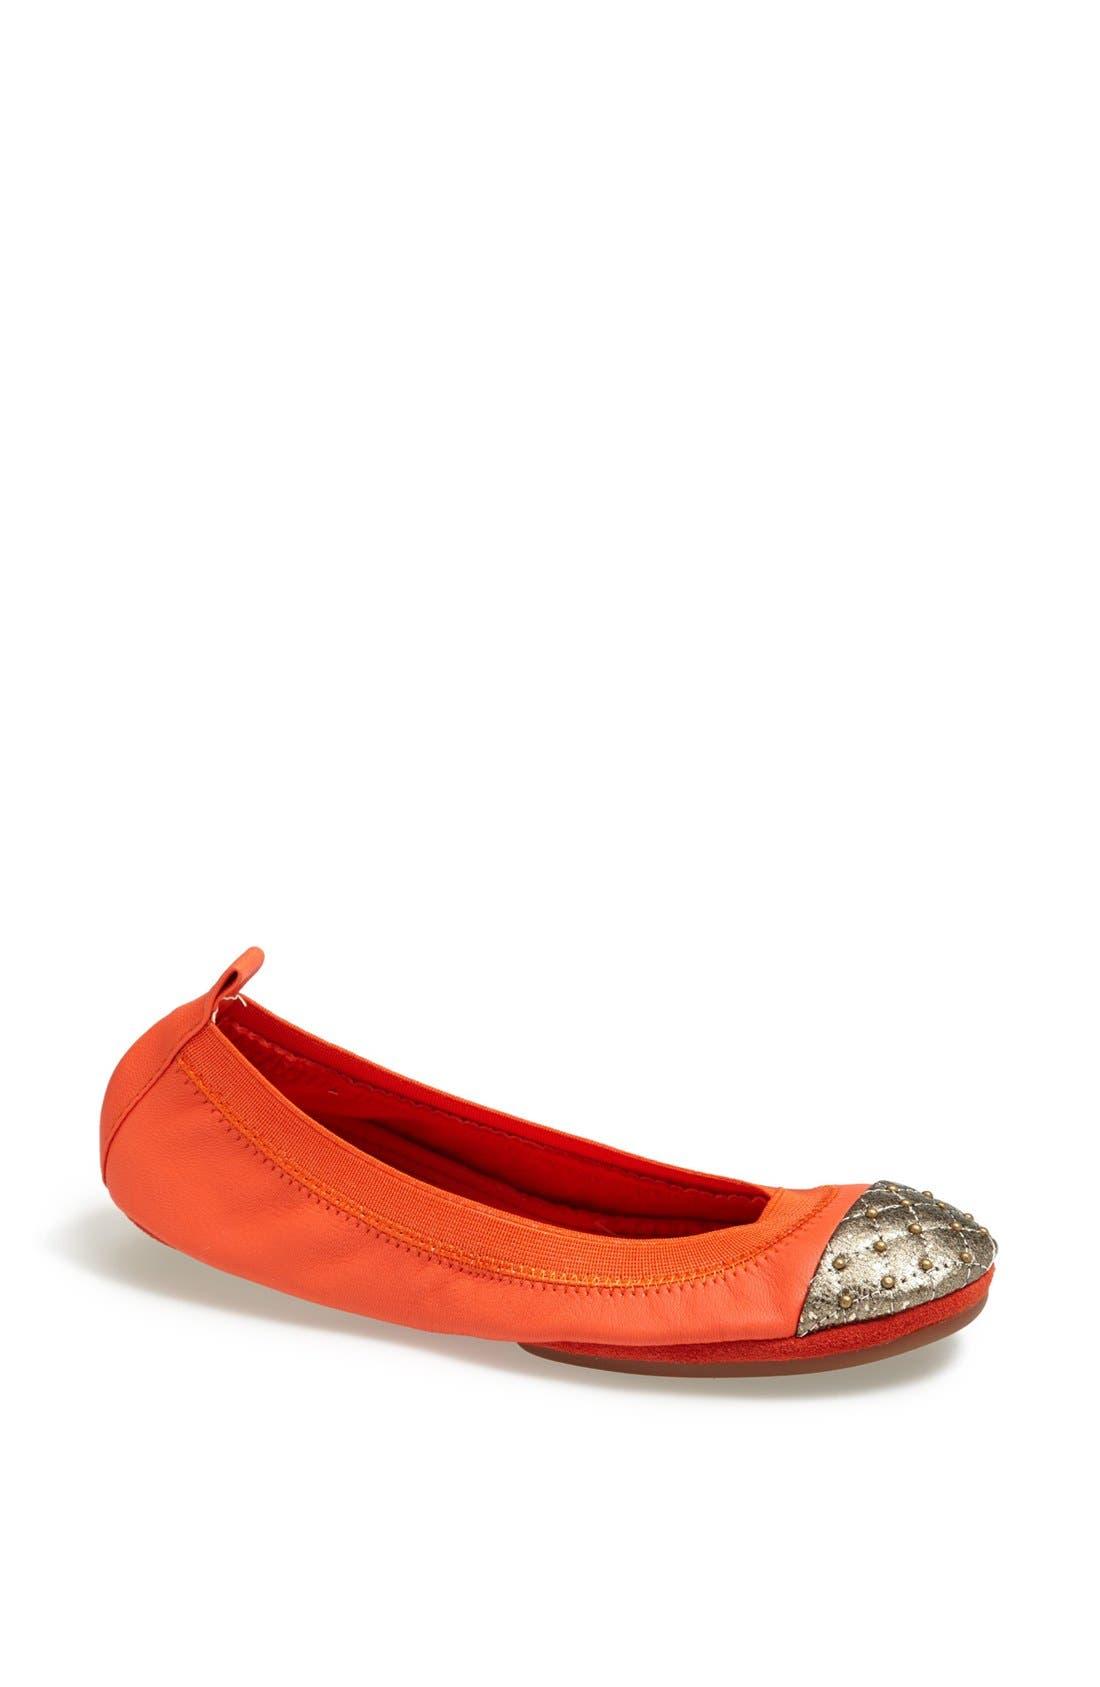 Alternate Image 1 Selected - Yosi Samra Studded Cap Toe Foldable Ballet Flat